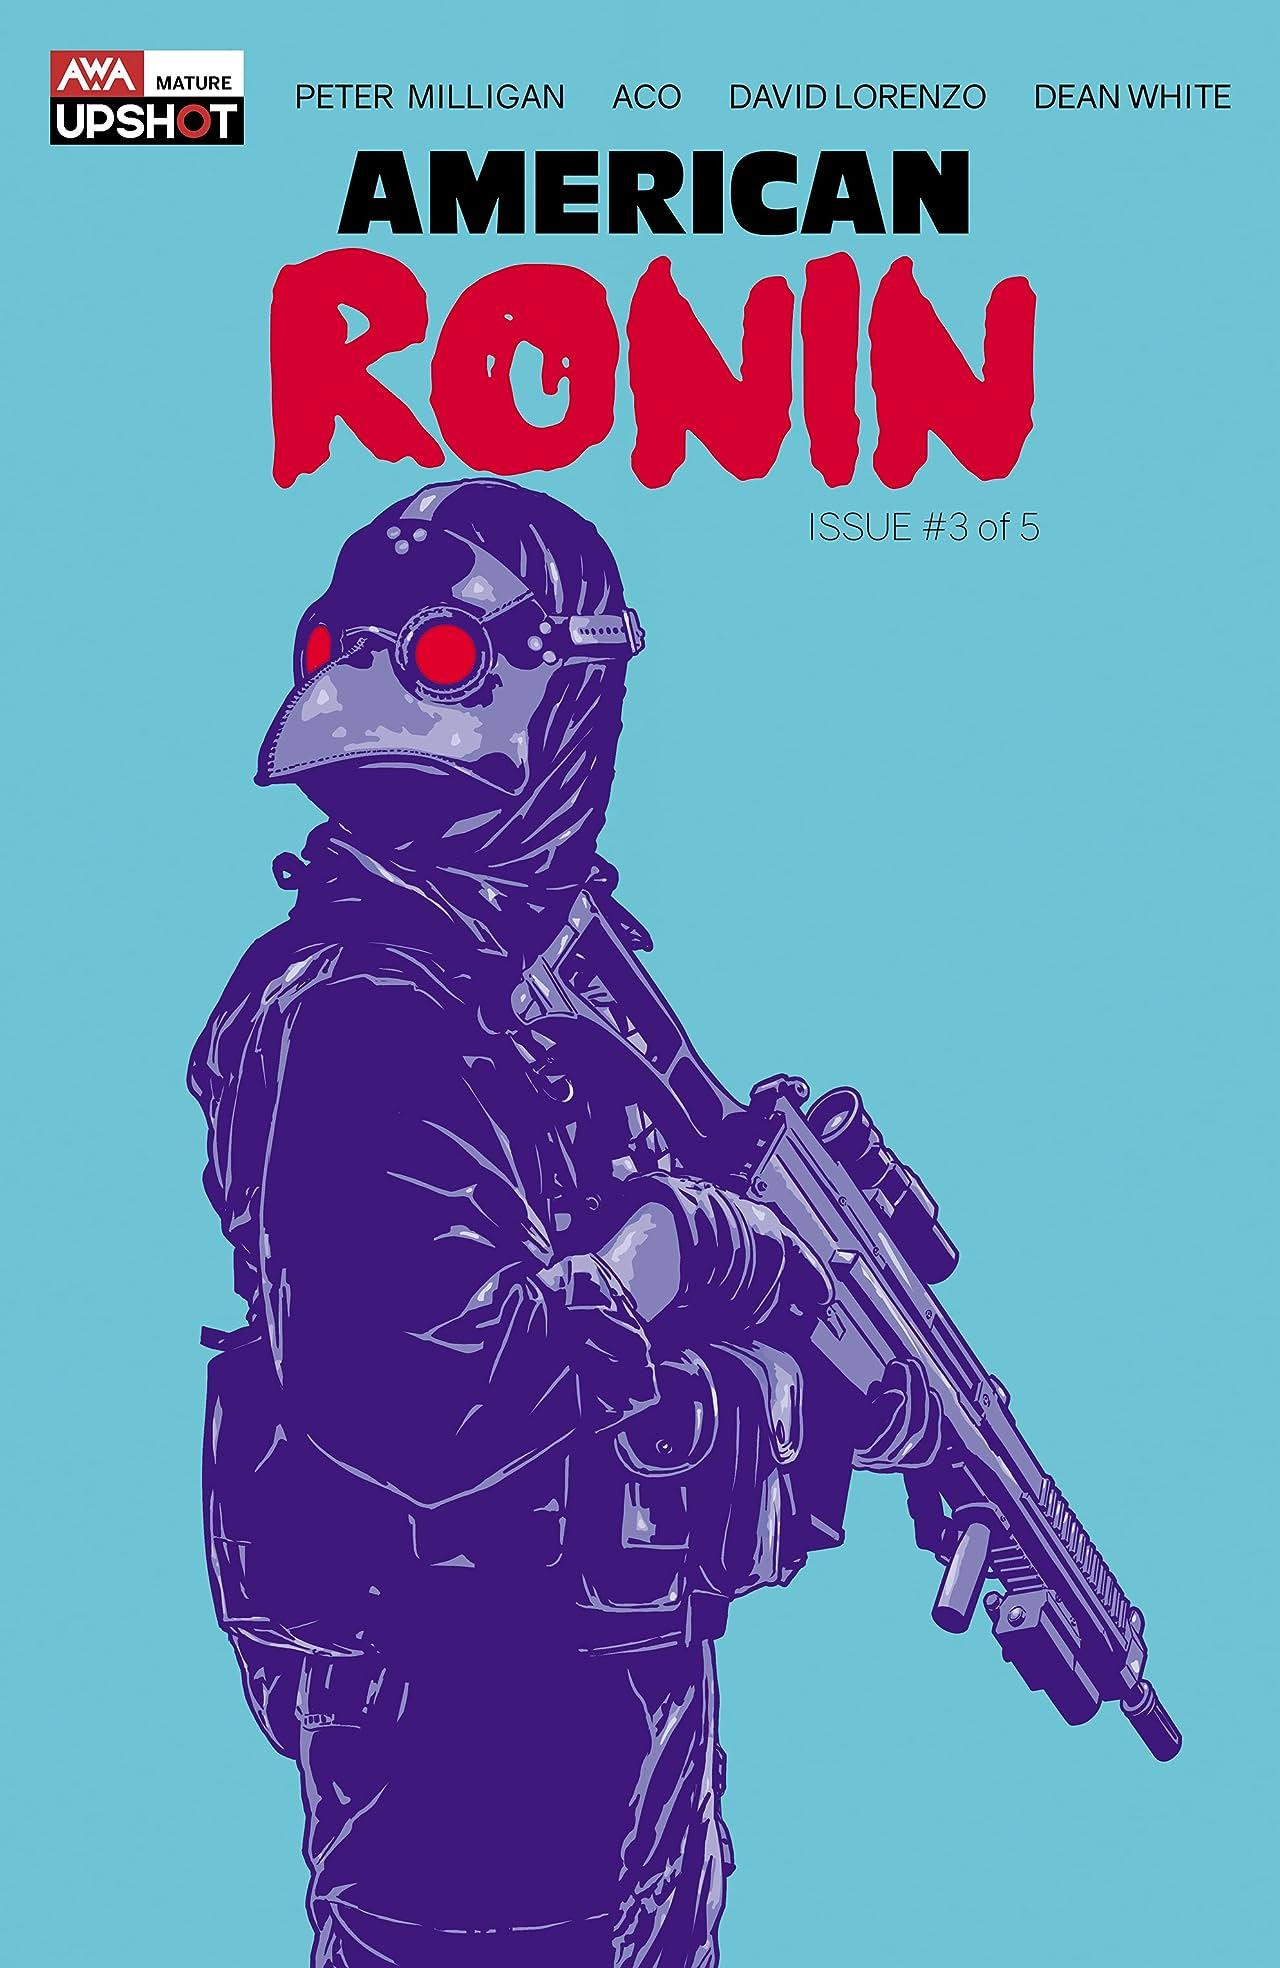 American Ronin #3 (of 5)